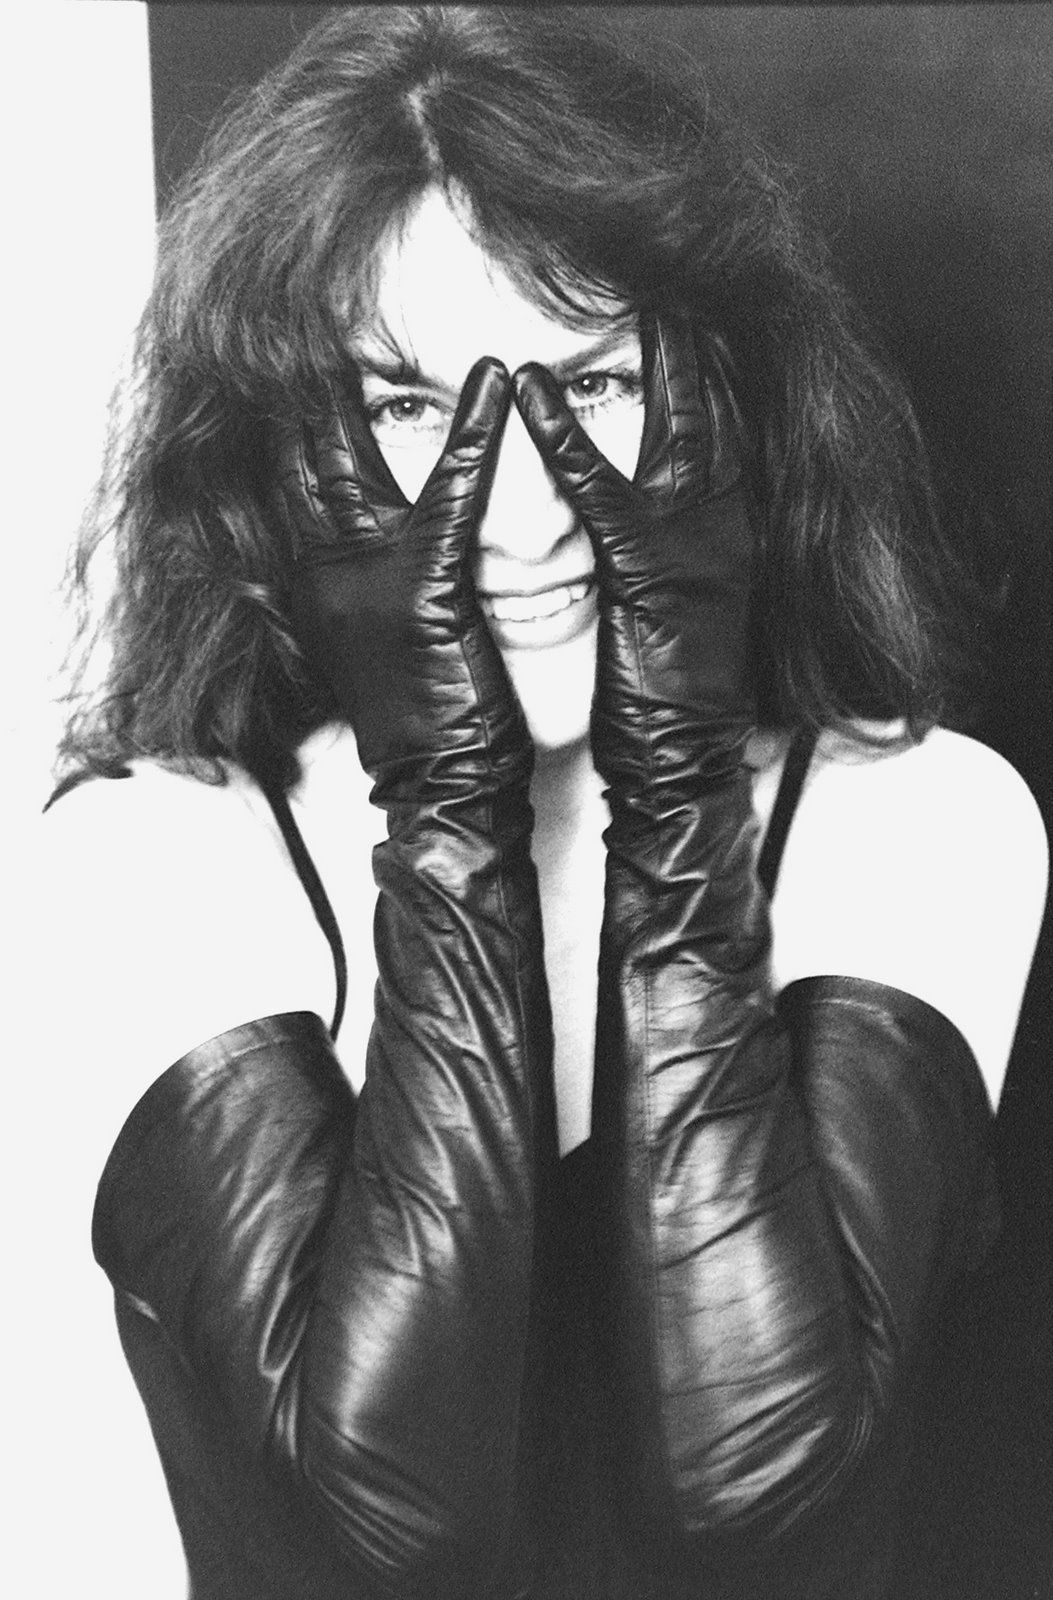 Cosmetics black leather gloves lyrics - Longs Gants En Cuir Glac Noir Les Gants De G Long Leather Gloves Black Leather